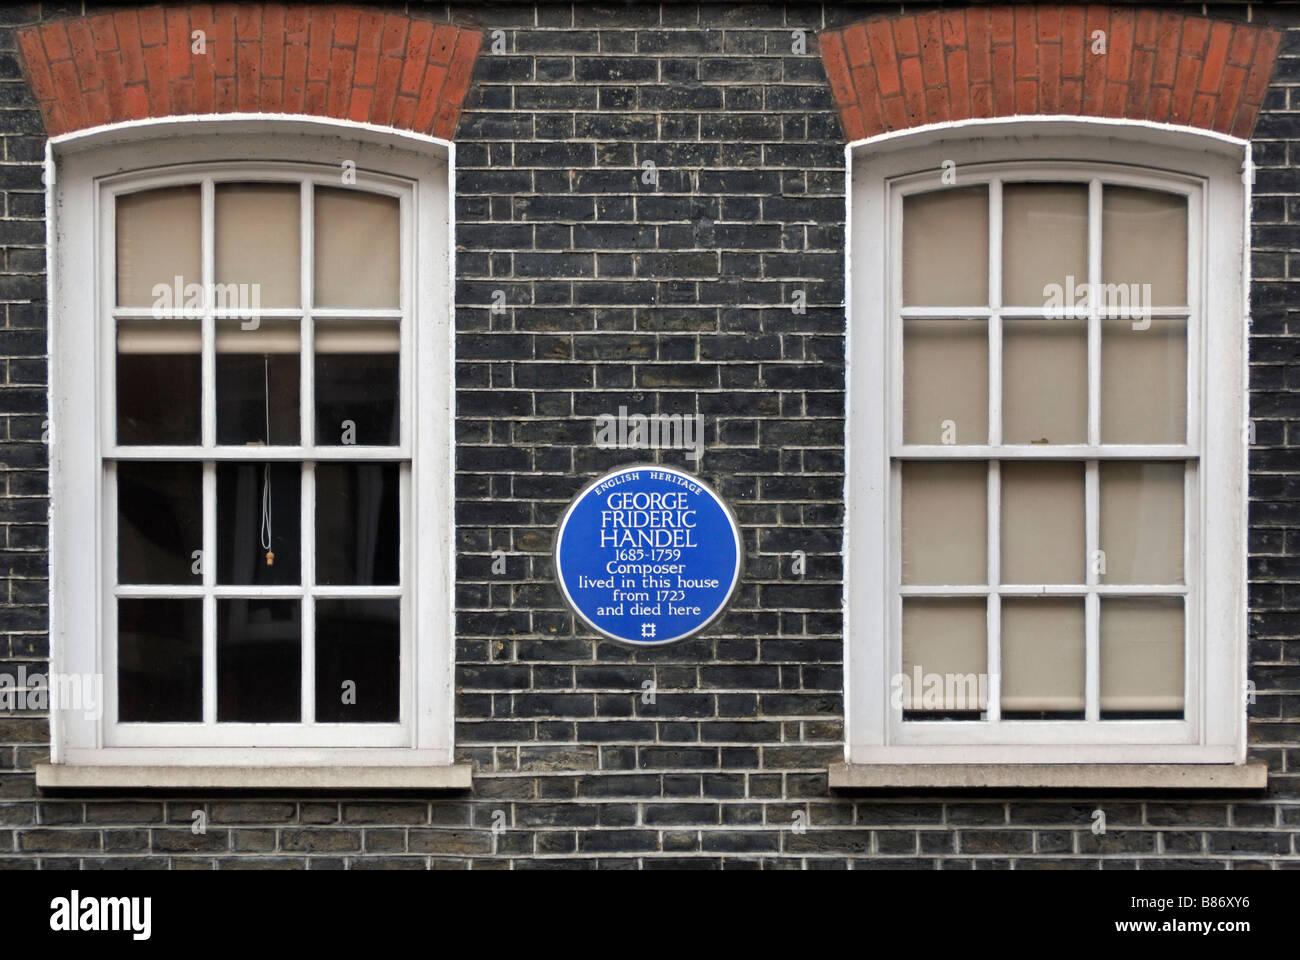 Handel Museum, Brook Street, London - Stock Image